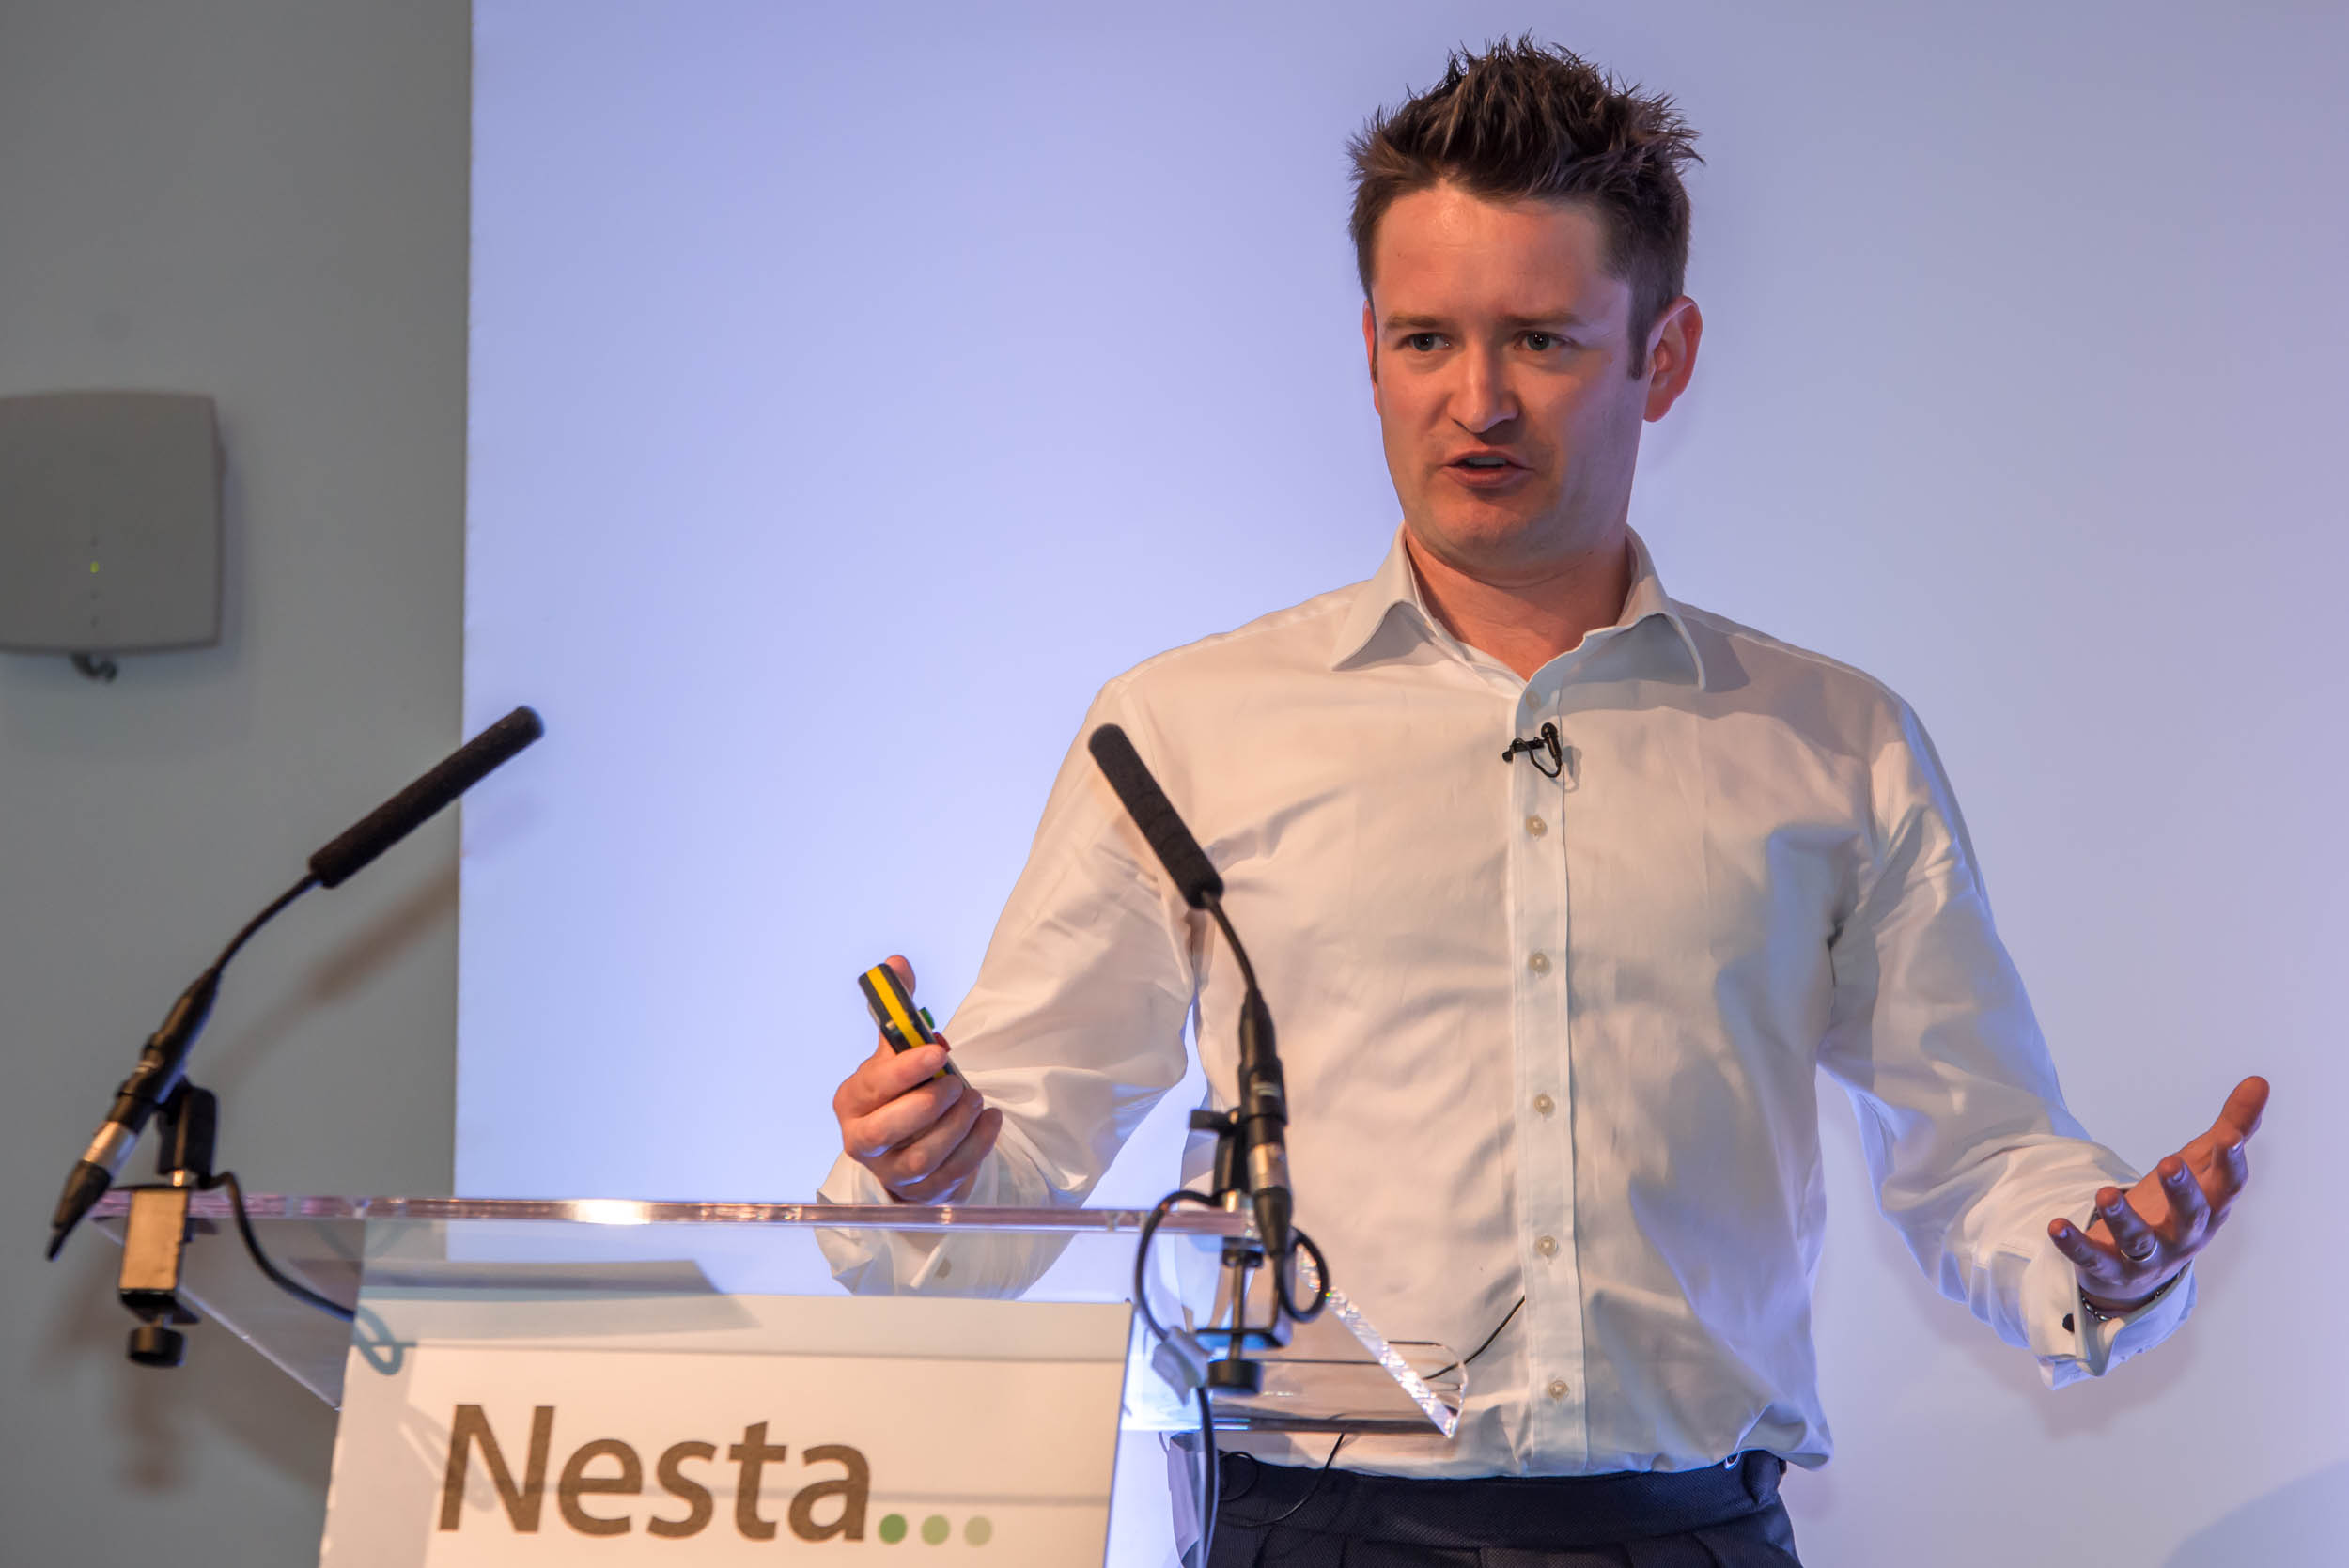 Nesta Conference, Edinburgh